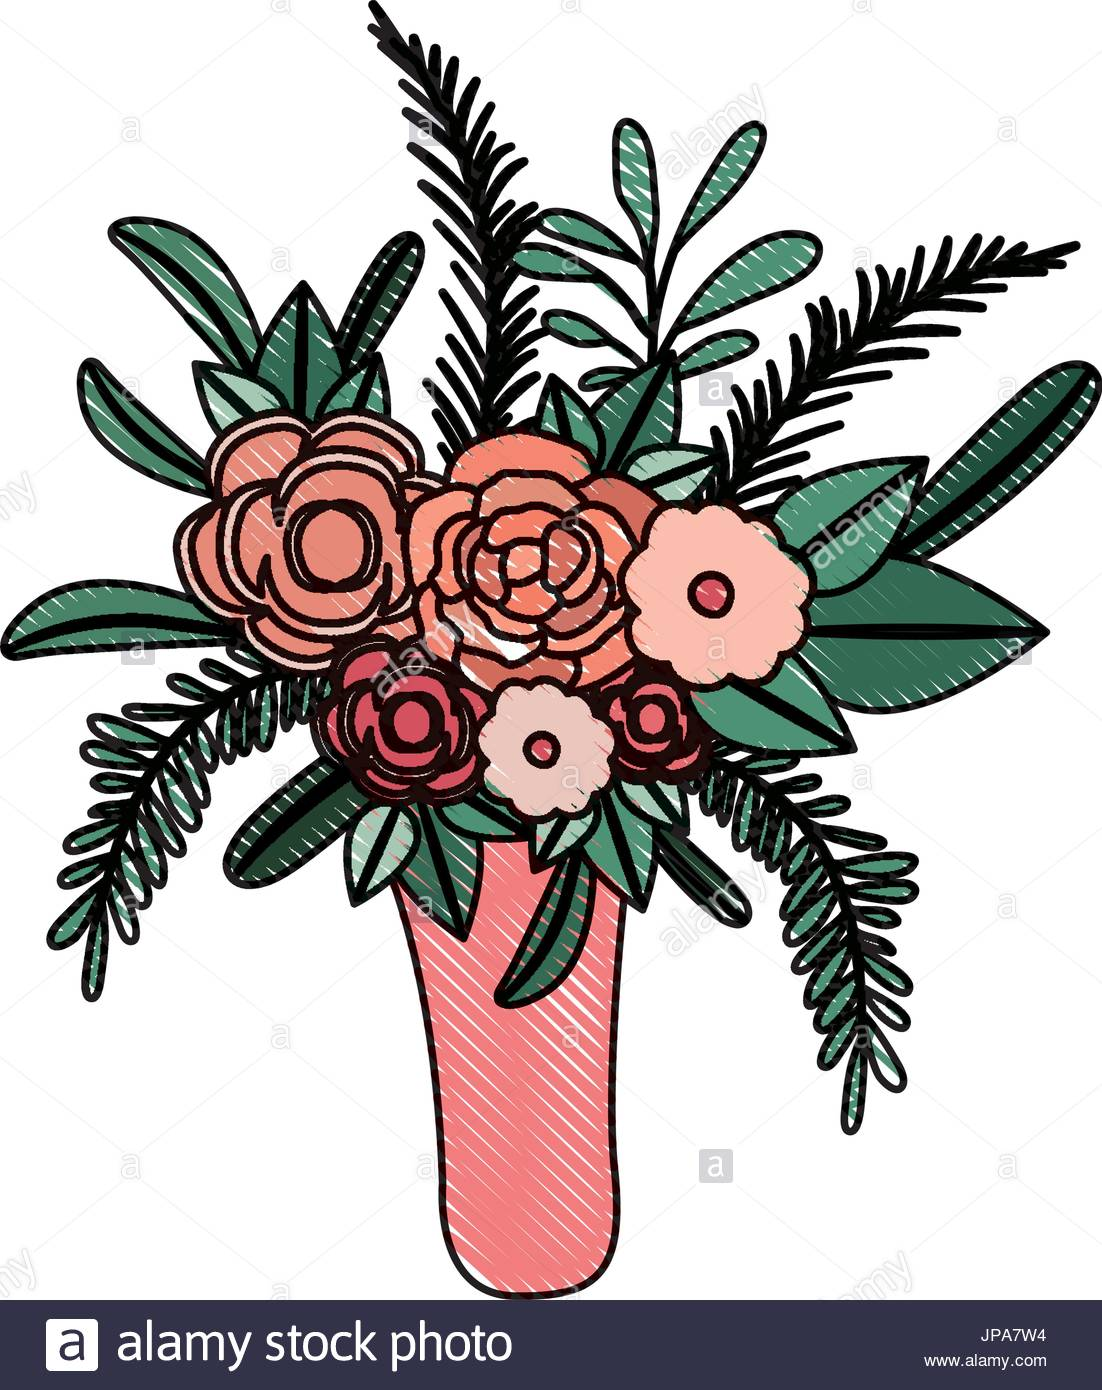 1102x1390 Illustration Silhouette Flower Vase Stock Photos Amp Illustration